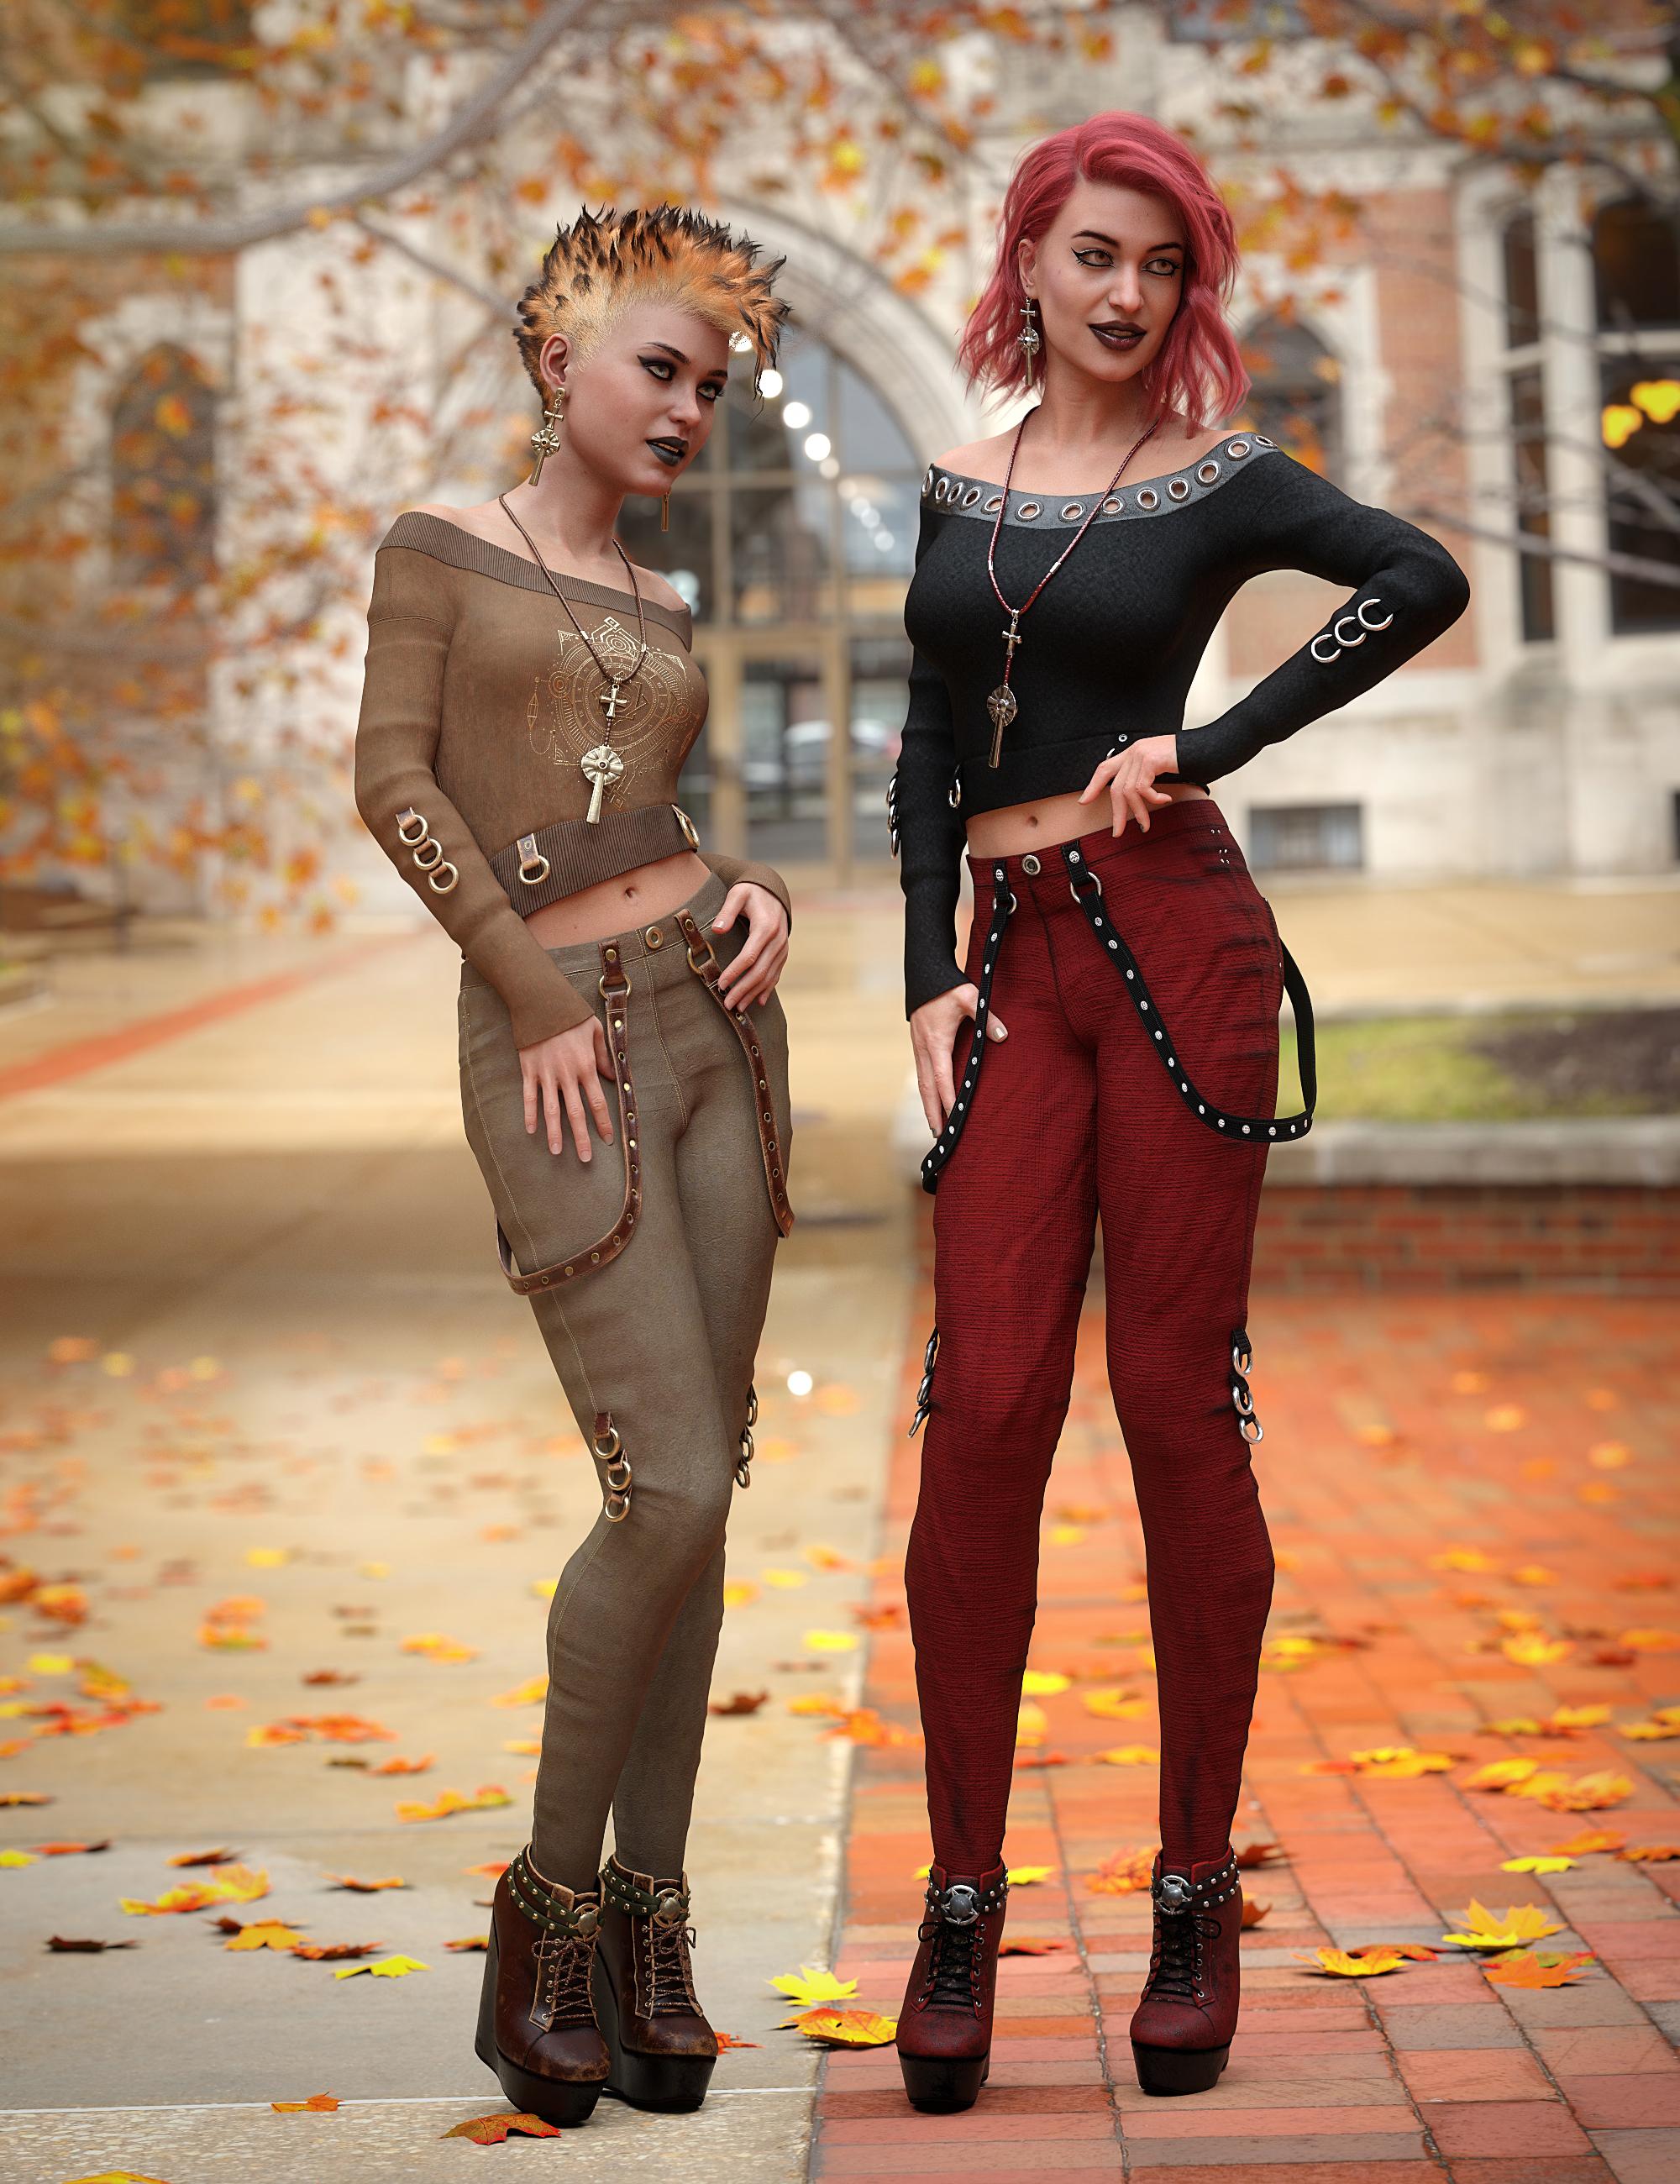 dForce Raven Black Outfit Textures by: 3D-GHDesignSade, 3D Models by Daz 3D